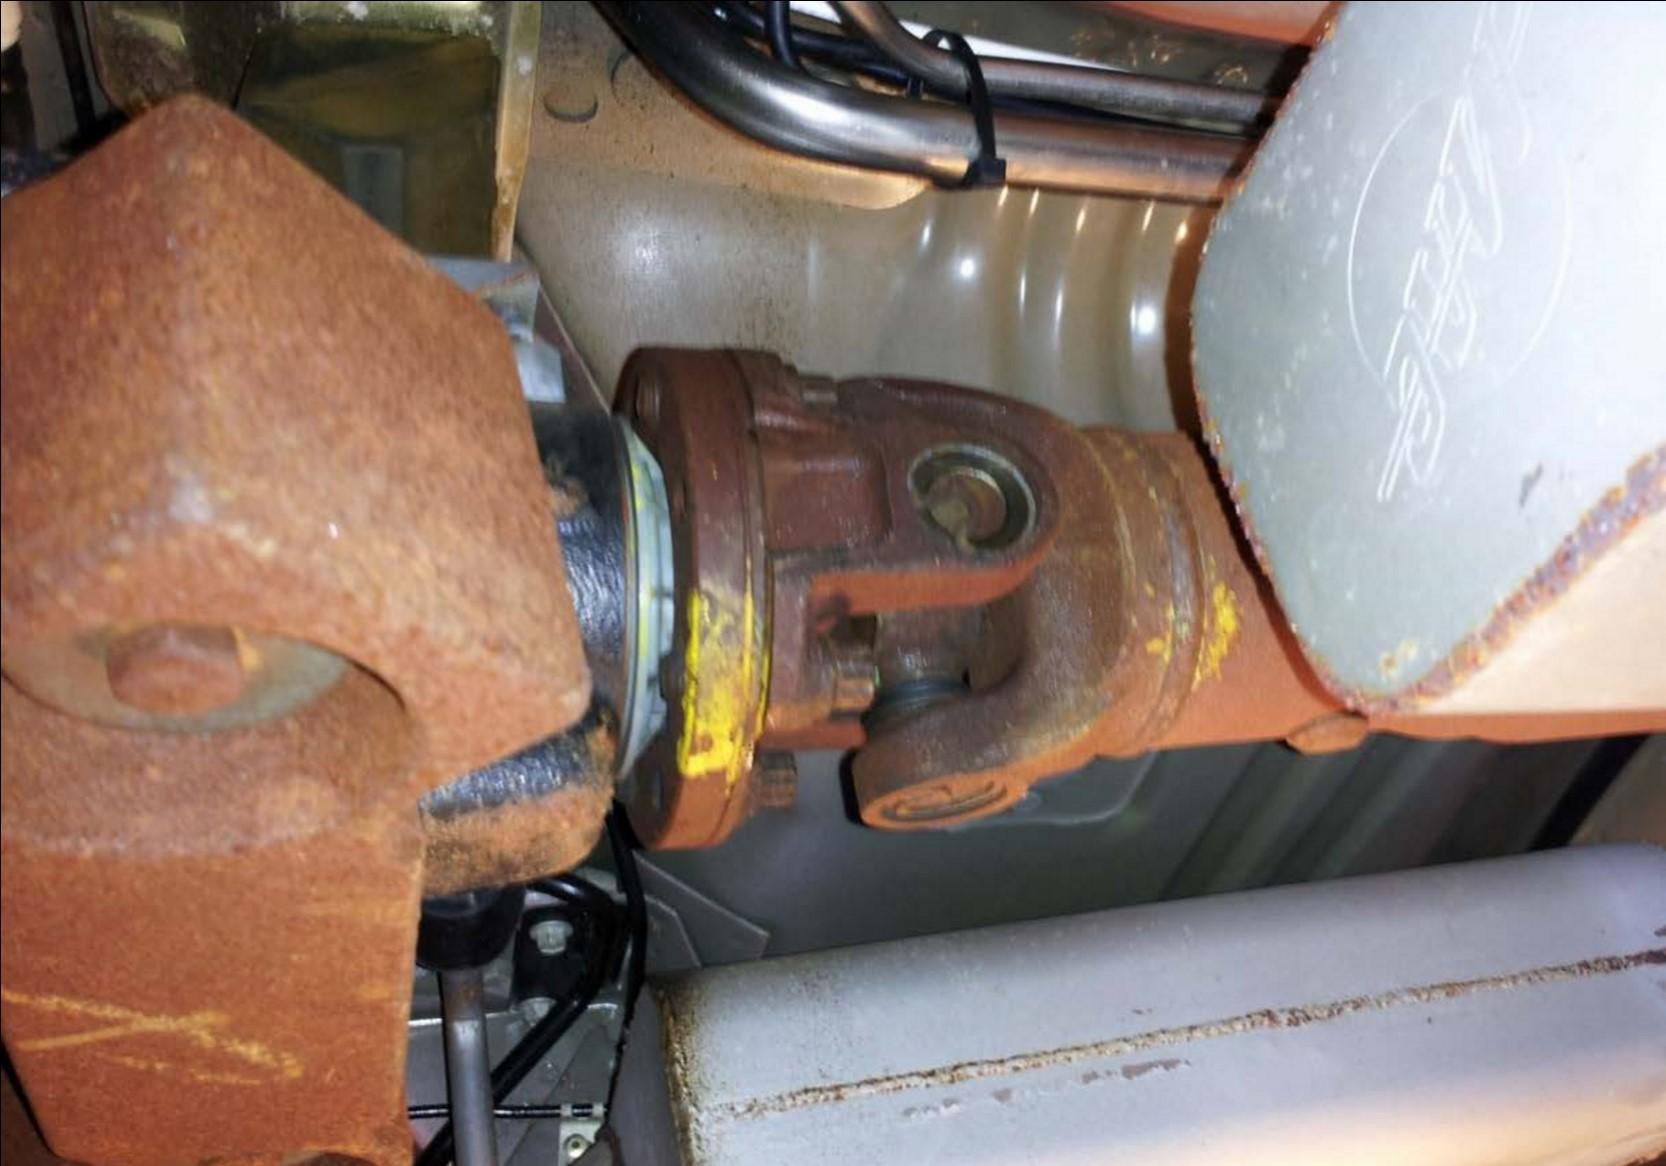 Aluminum One Piece Driveshaft - 31 Spline (96-04 GT, Mach 1; 96-98 Cobra) Install 2